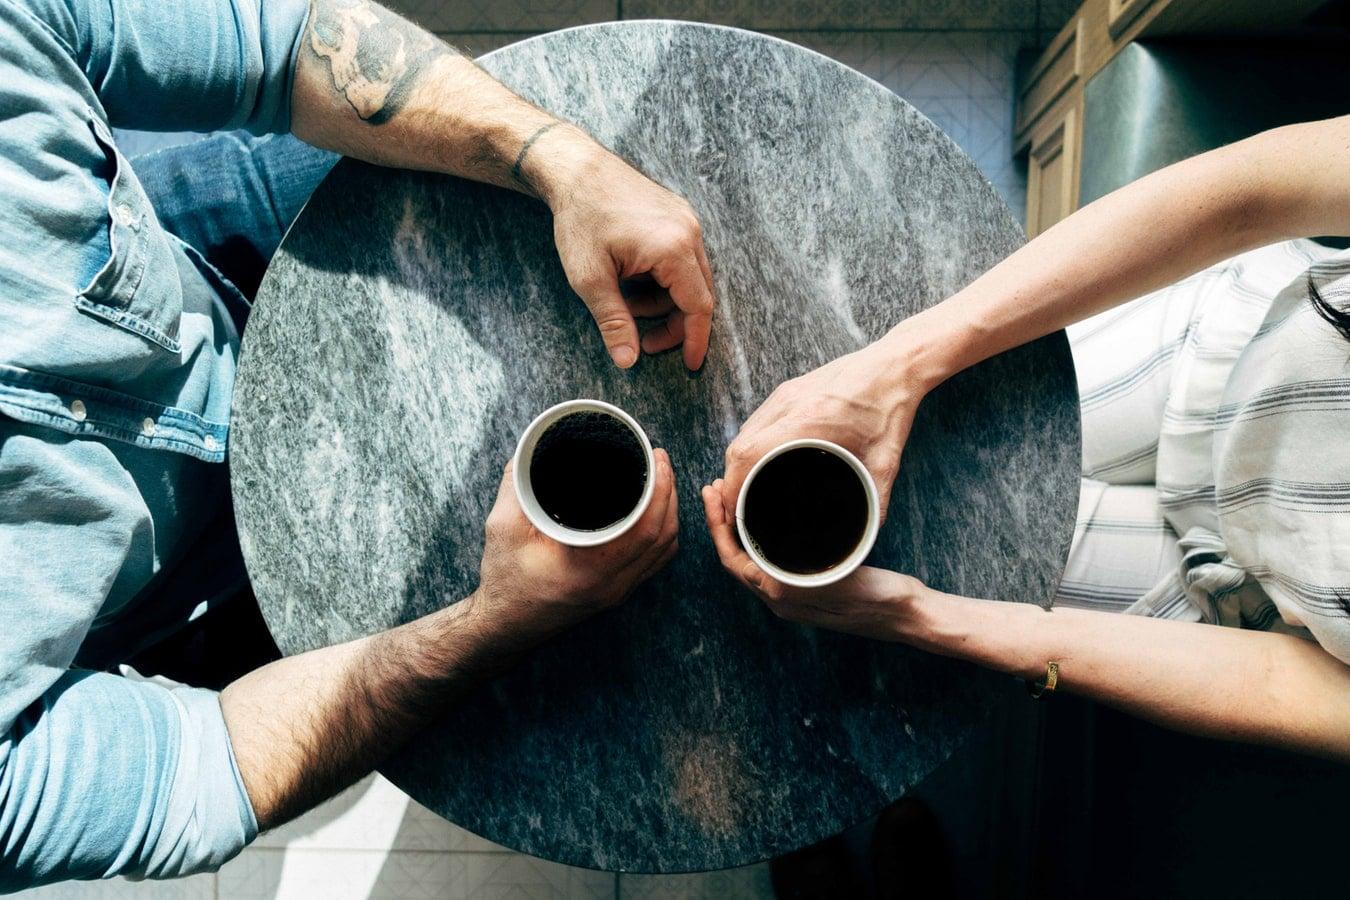 draguer cafe couple terrasser tromper